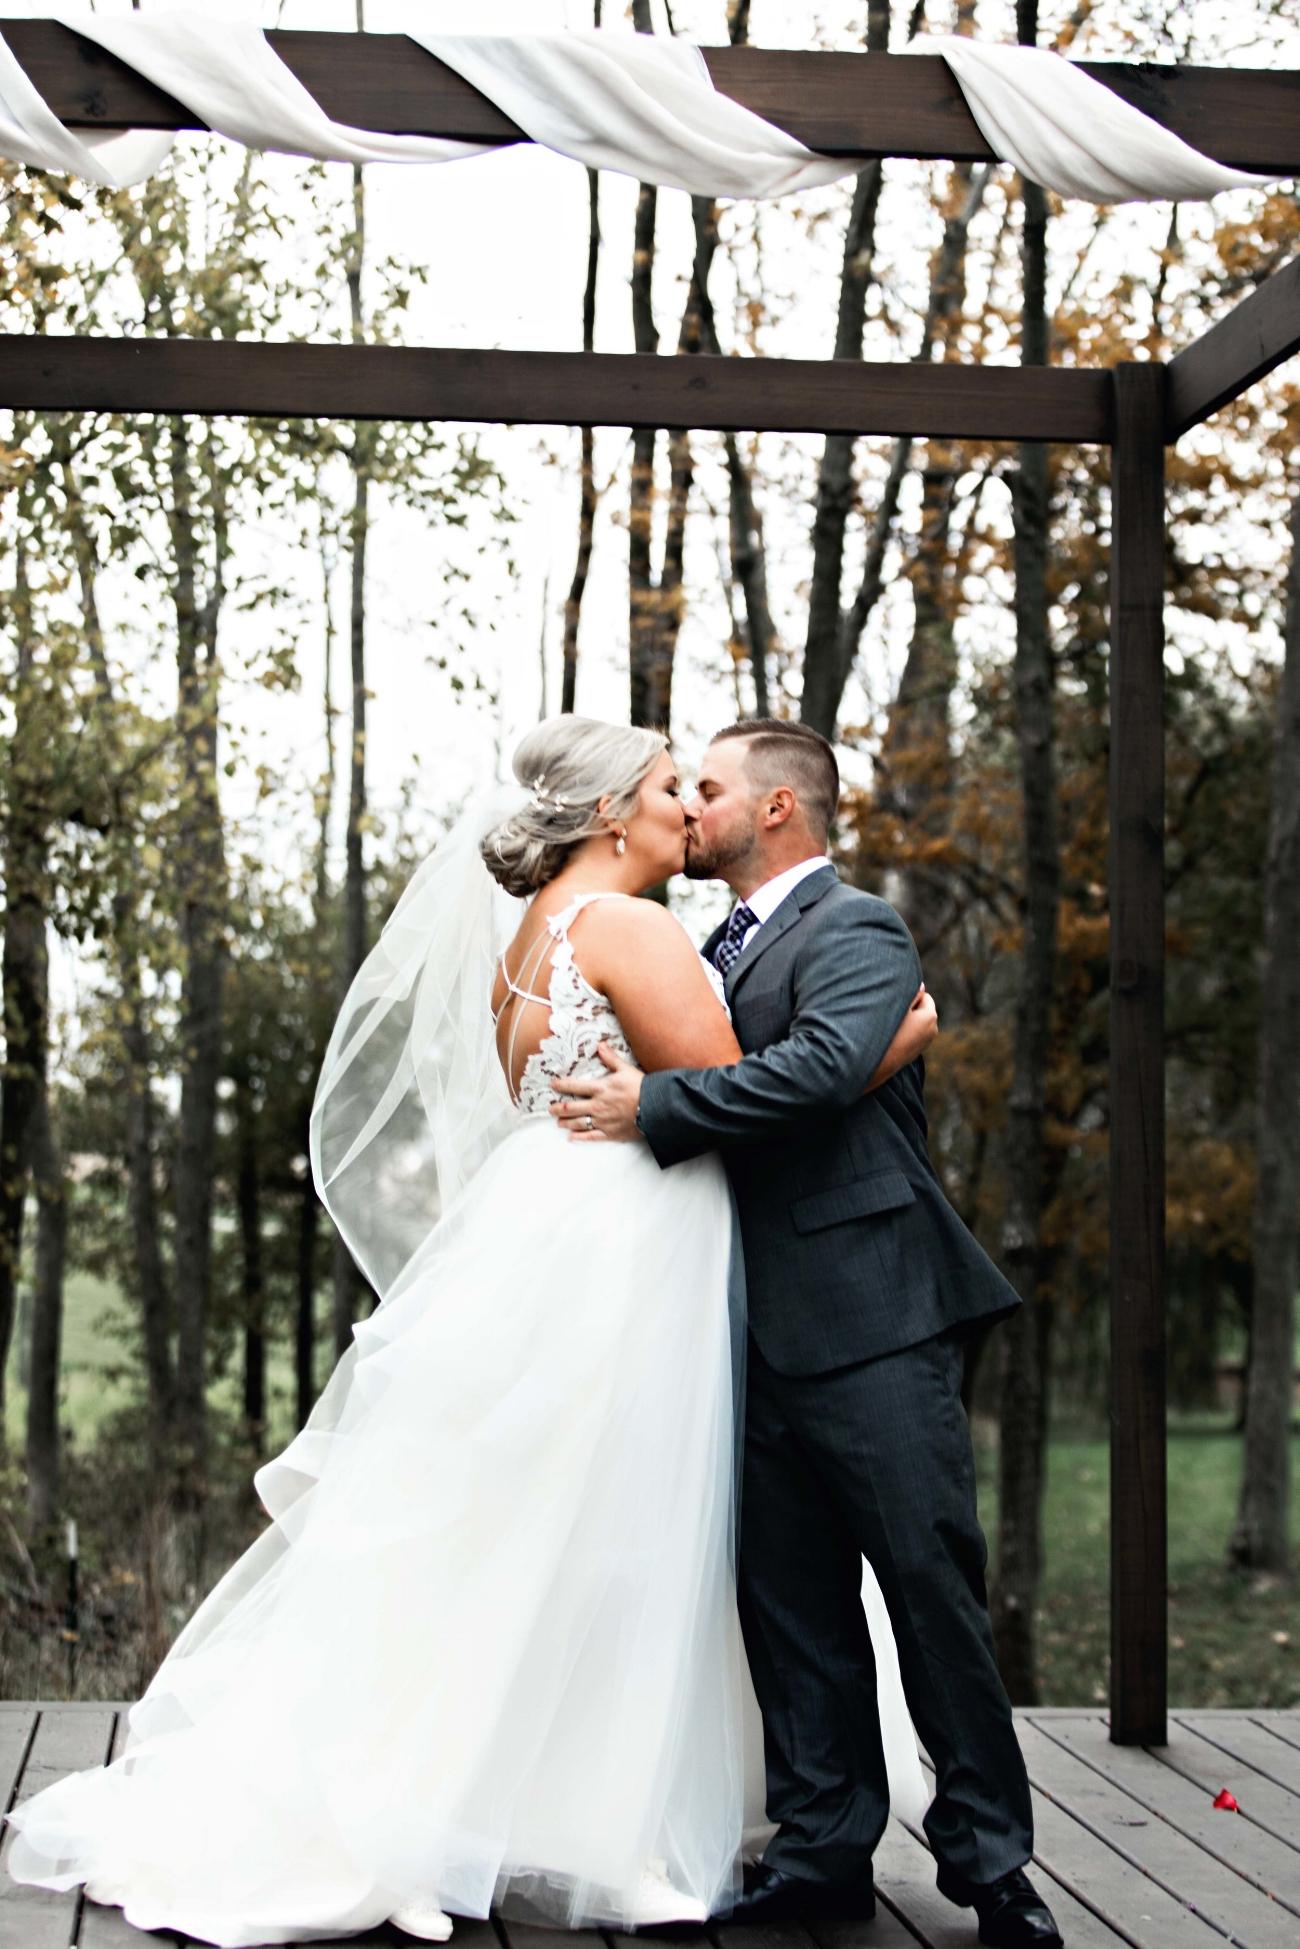 BridesbyYoung-Curvy-BlushHayleyPaige-Madi-Wedding-Inspiration-24.jpg